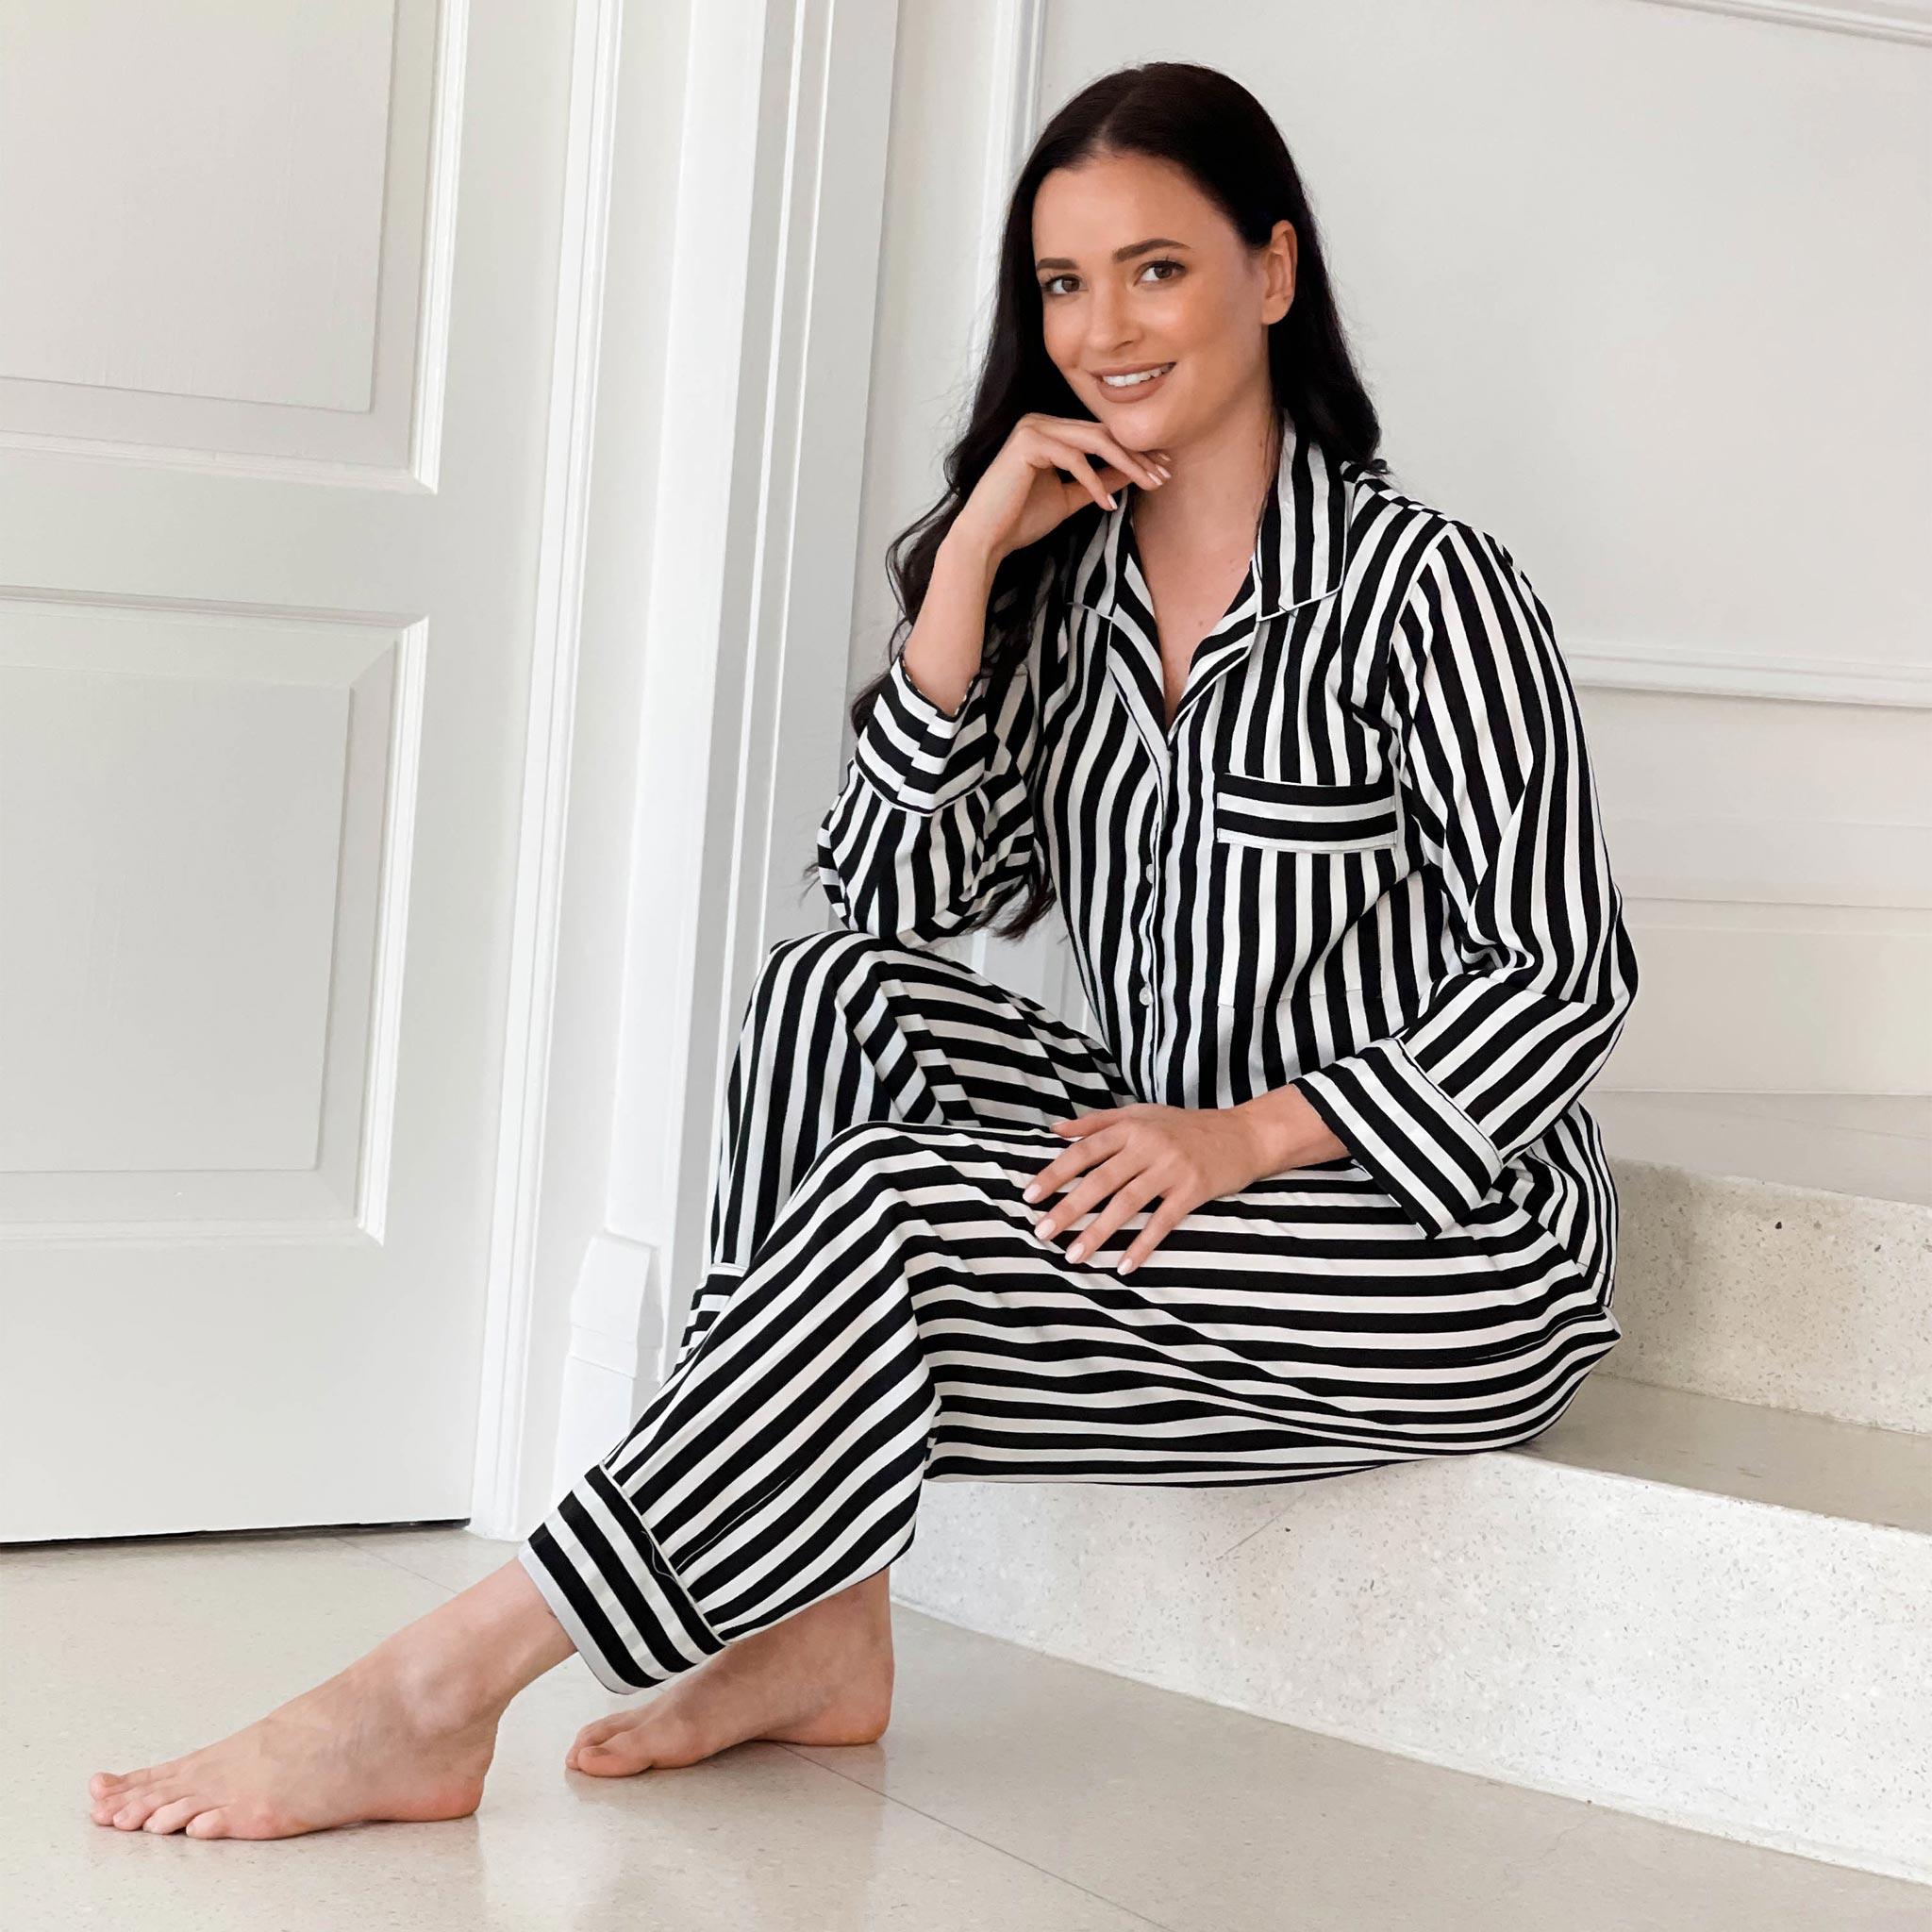 Women's Luxurious Sleepwear Black & White Striped Pajamas